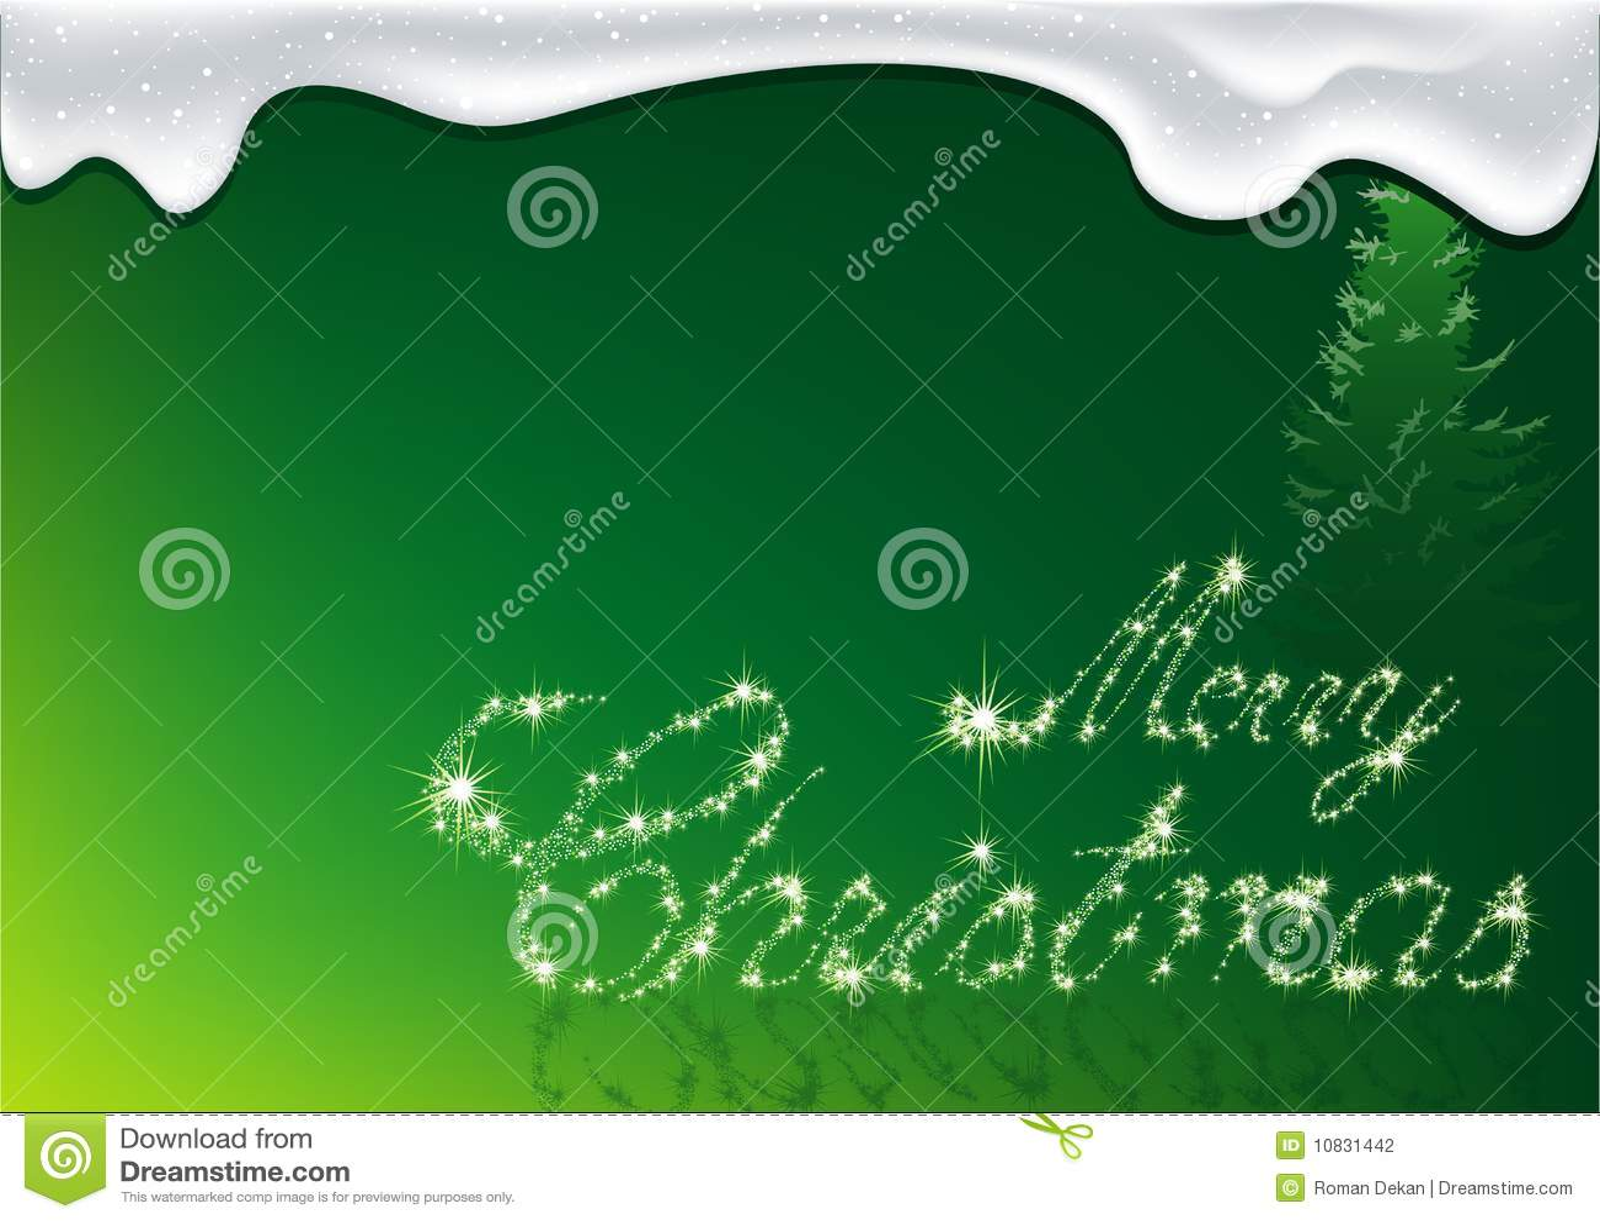 Green Christmas - Greeting Card